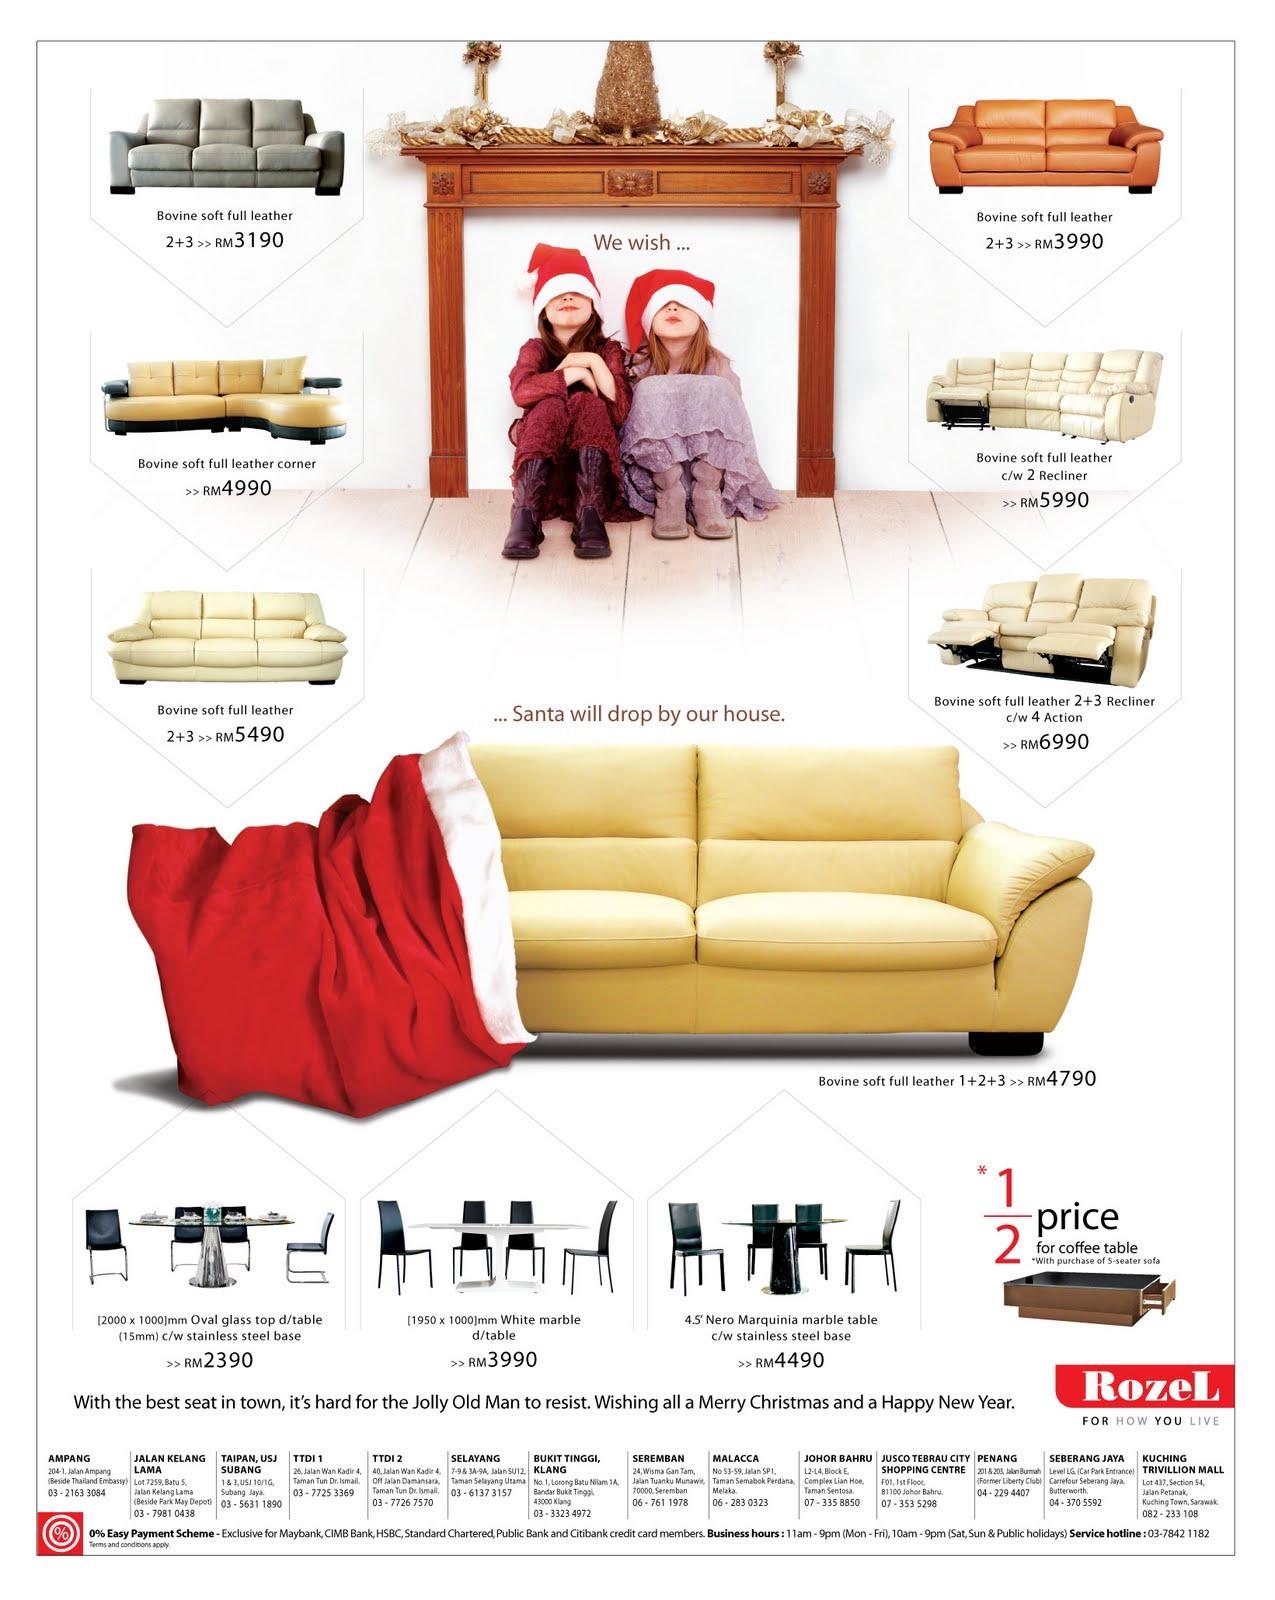 Siokteng Rozel Christmas Press Ad